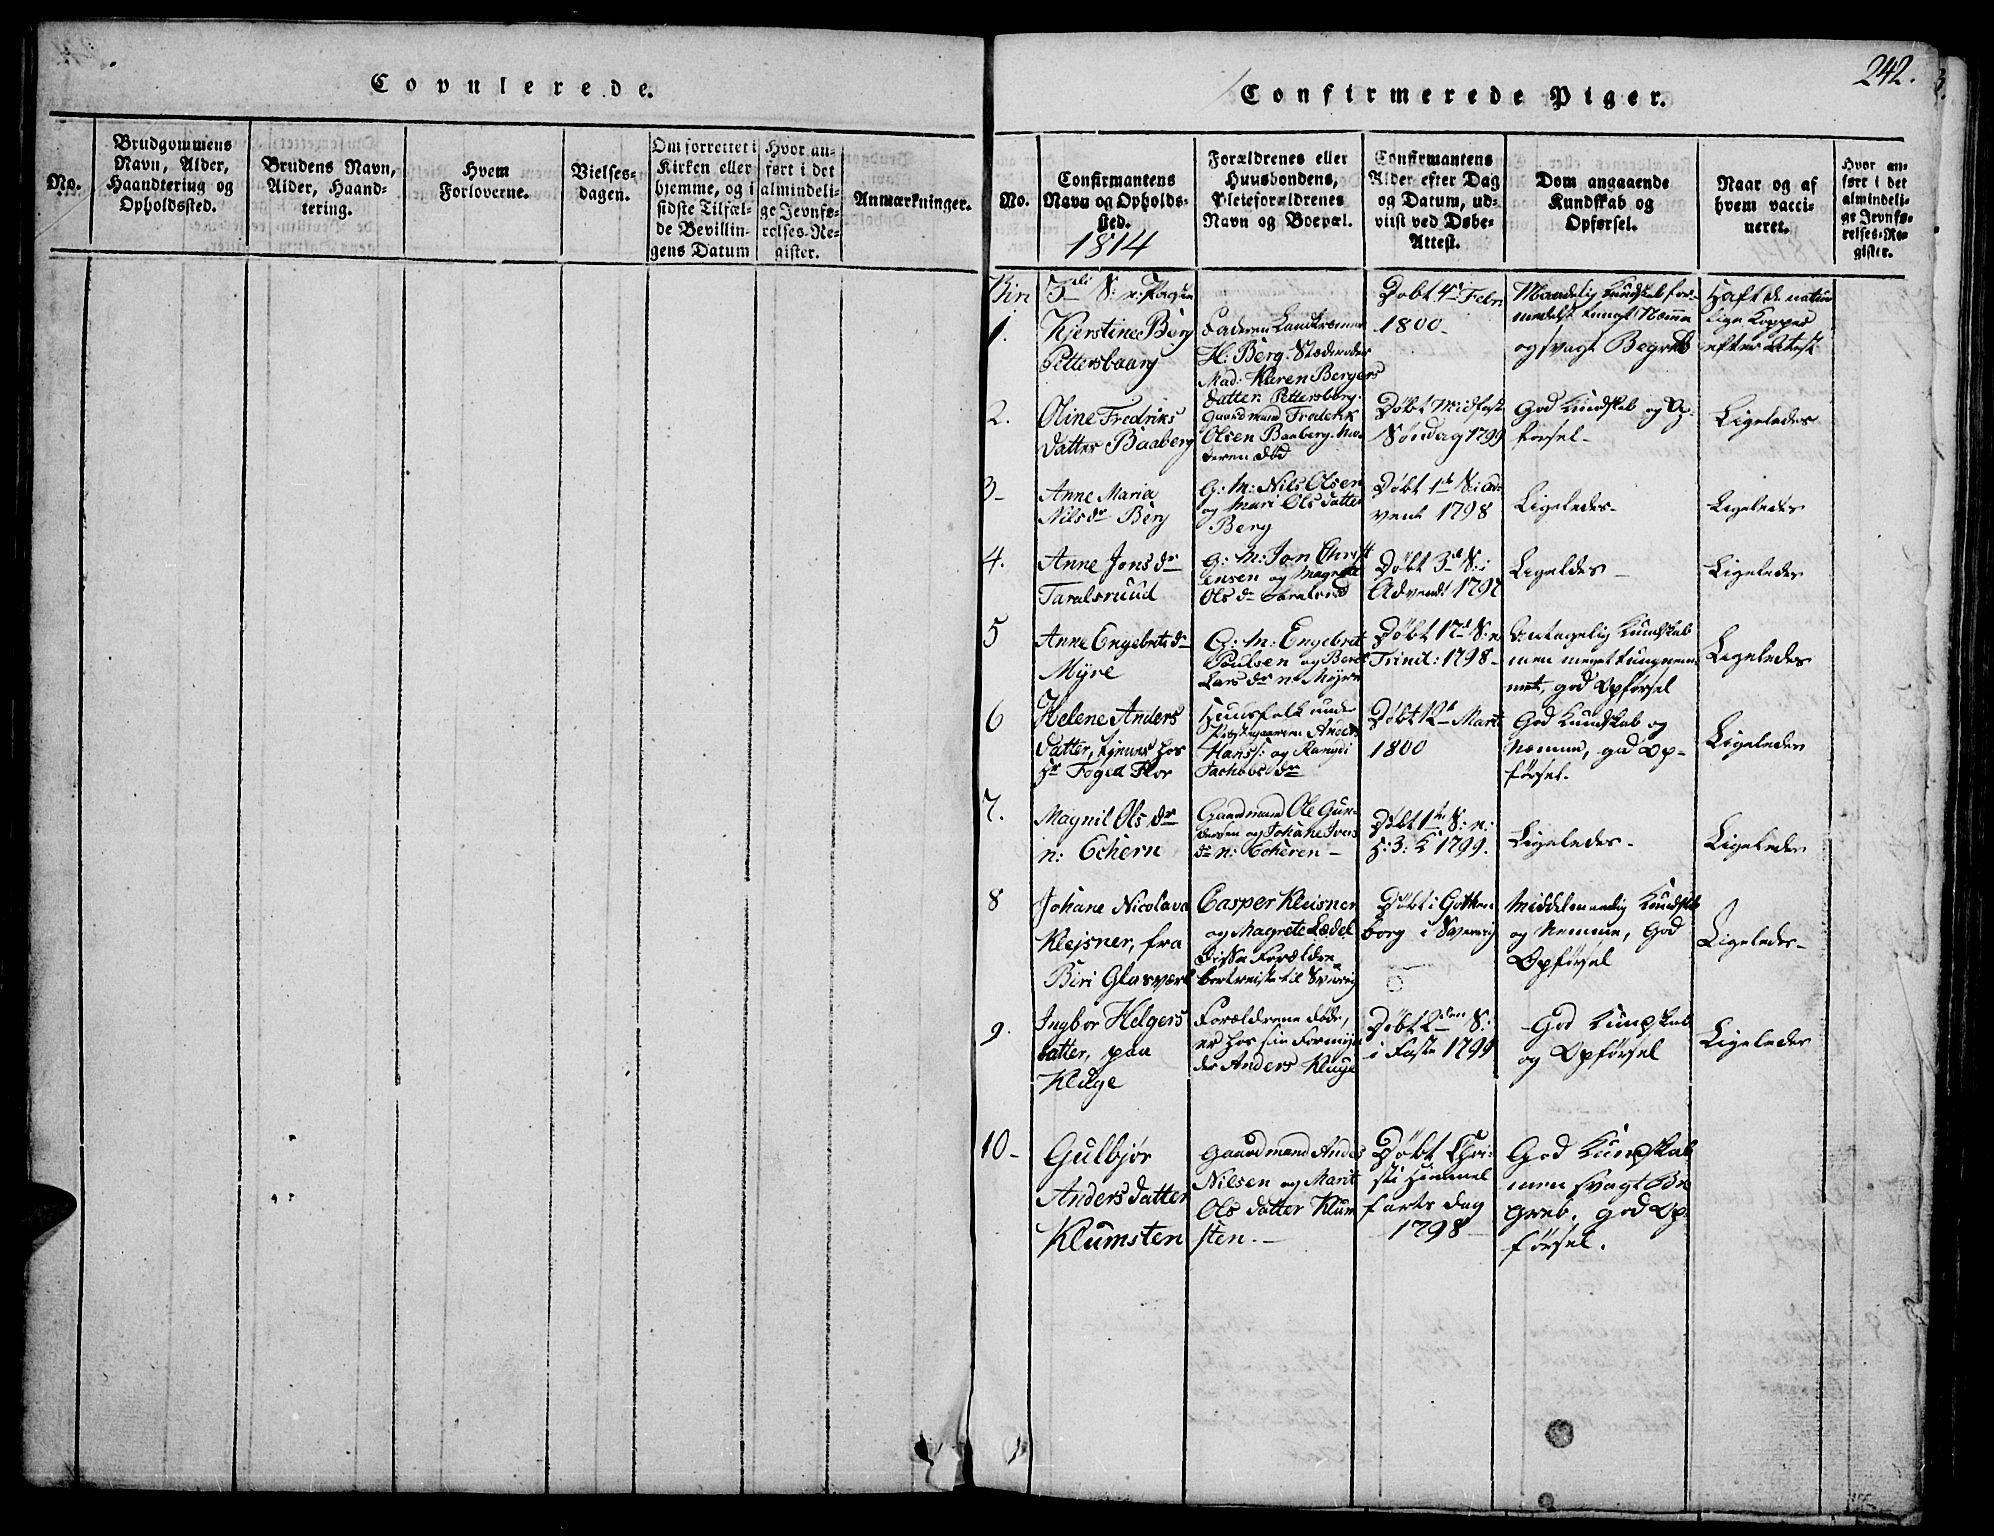 SAH, Biri prestekontor, Klokkerbok nr. 1, 1814-1828, s. 242